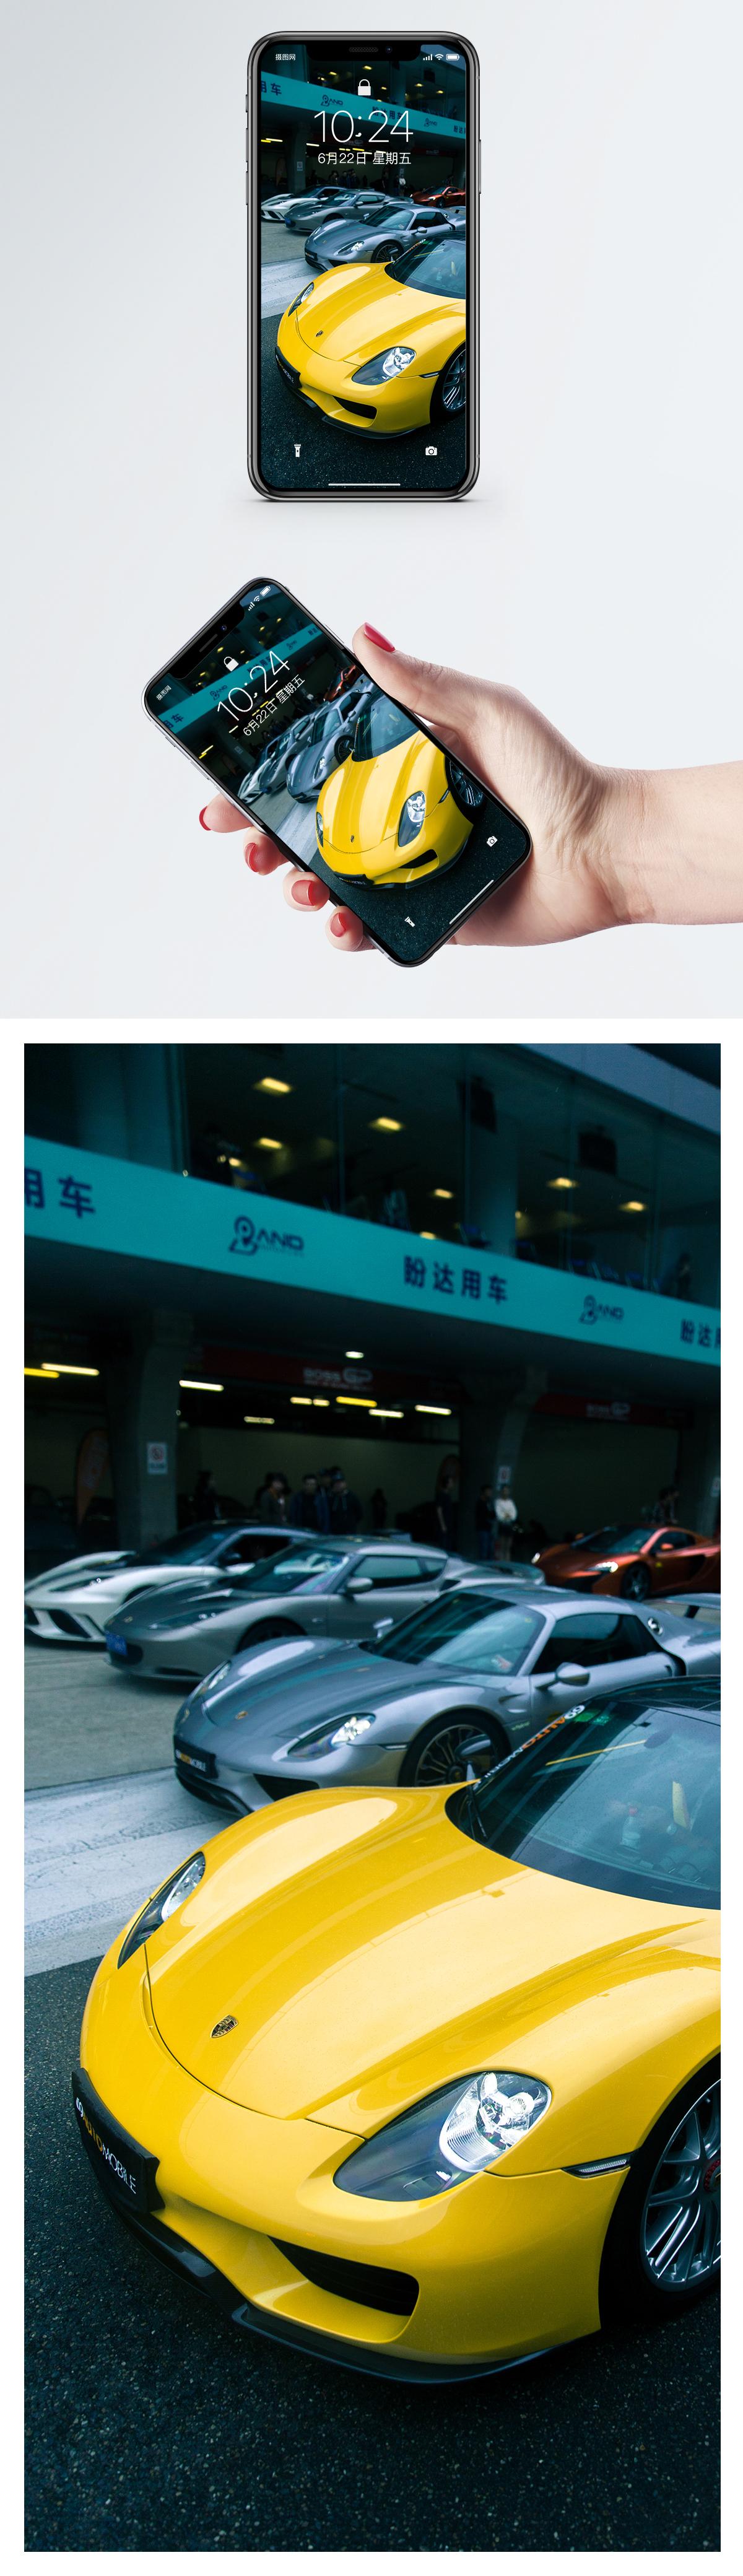 Sports Car Mobile Wallpaper Backgrounds Images Free Download 400607335 Lovepik Com